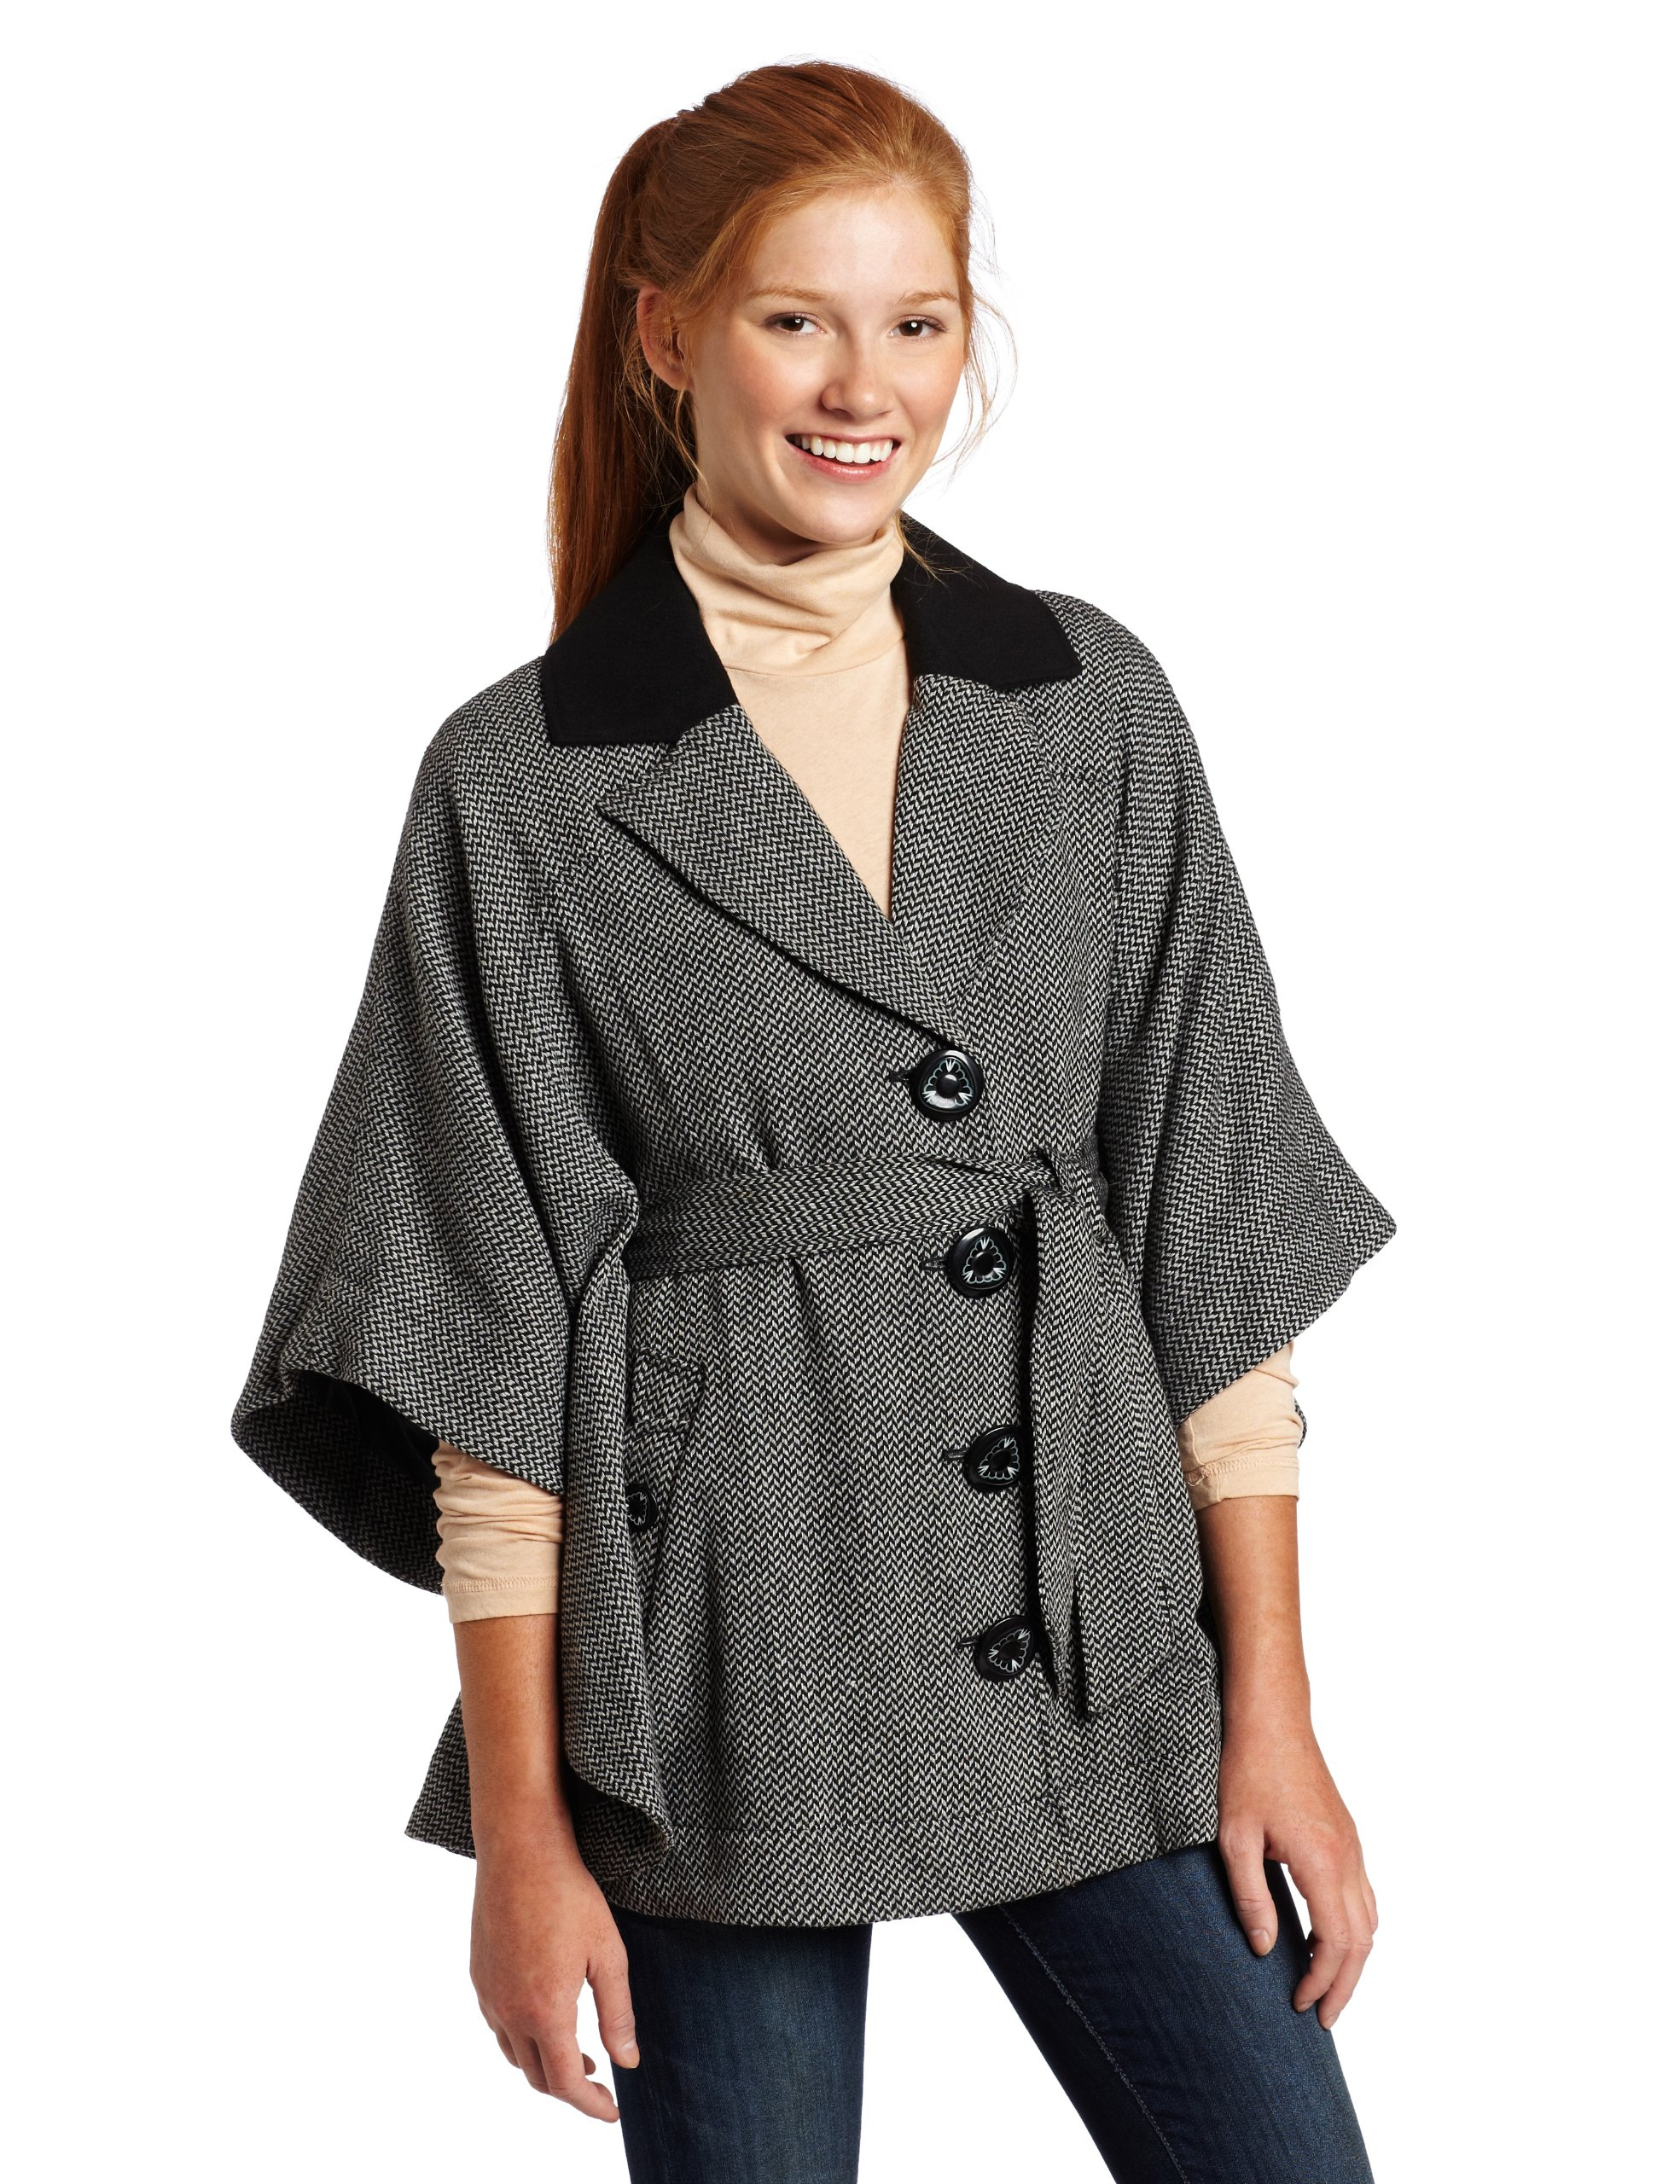 Jolt Juniors Cape Coat, Black, Medium